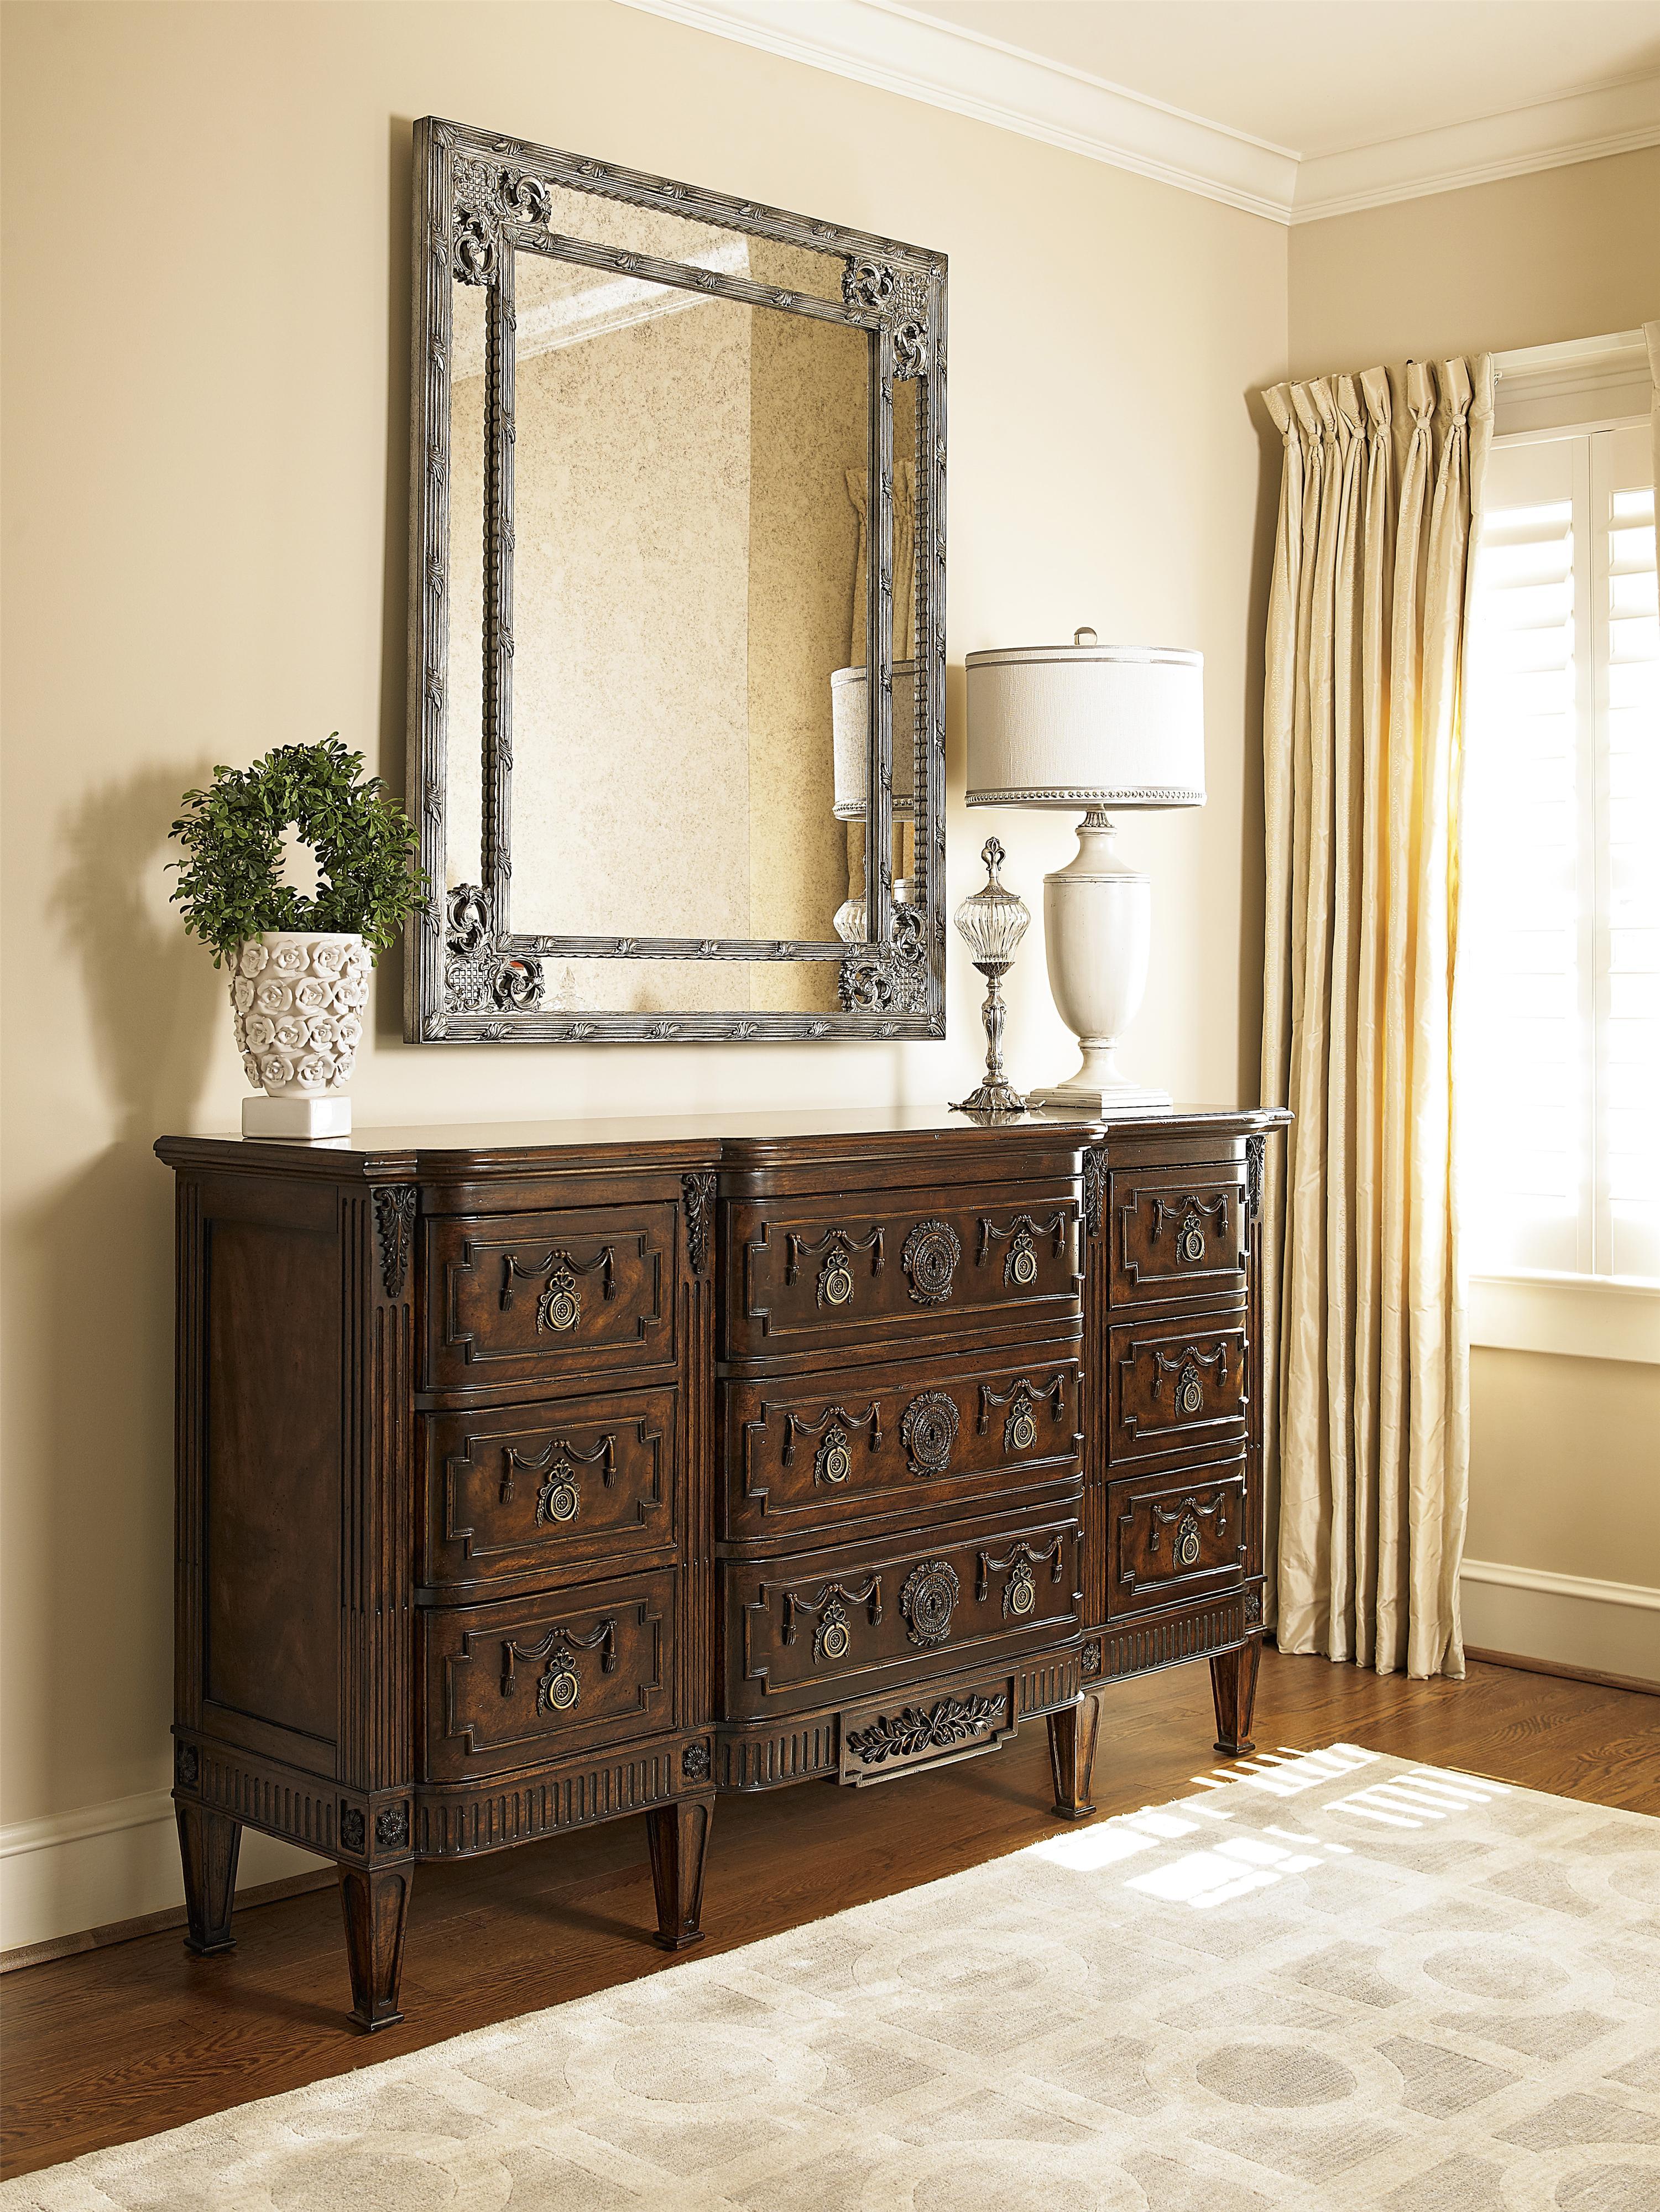 Fine Furniture Design Biltmore Mirror With Antique Surface